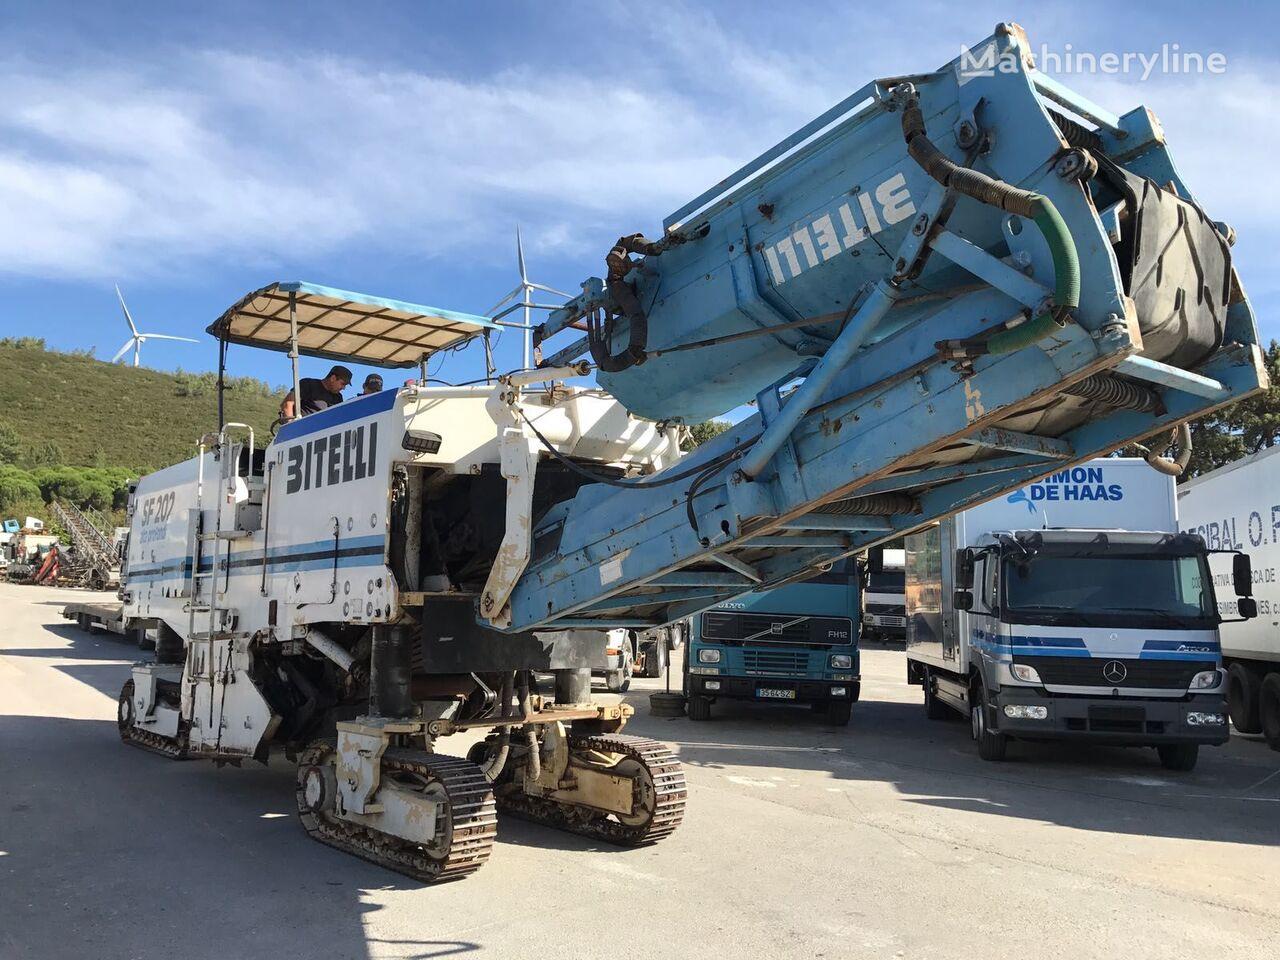 fresadora de asfalto BITELLI SF 202 R - COLD PLANNER / ROAD CUTTER / ASPHALT MILLING MACHINE